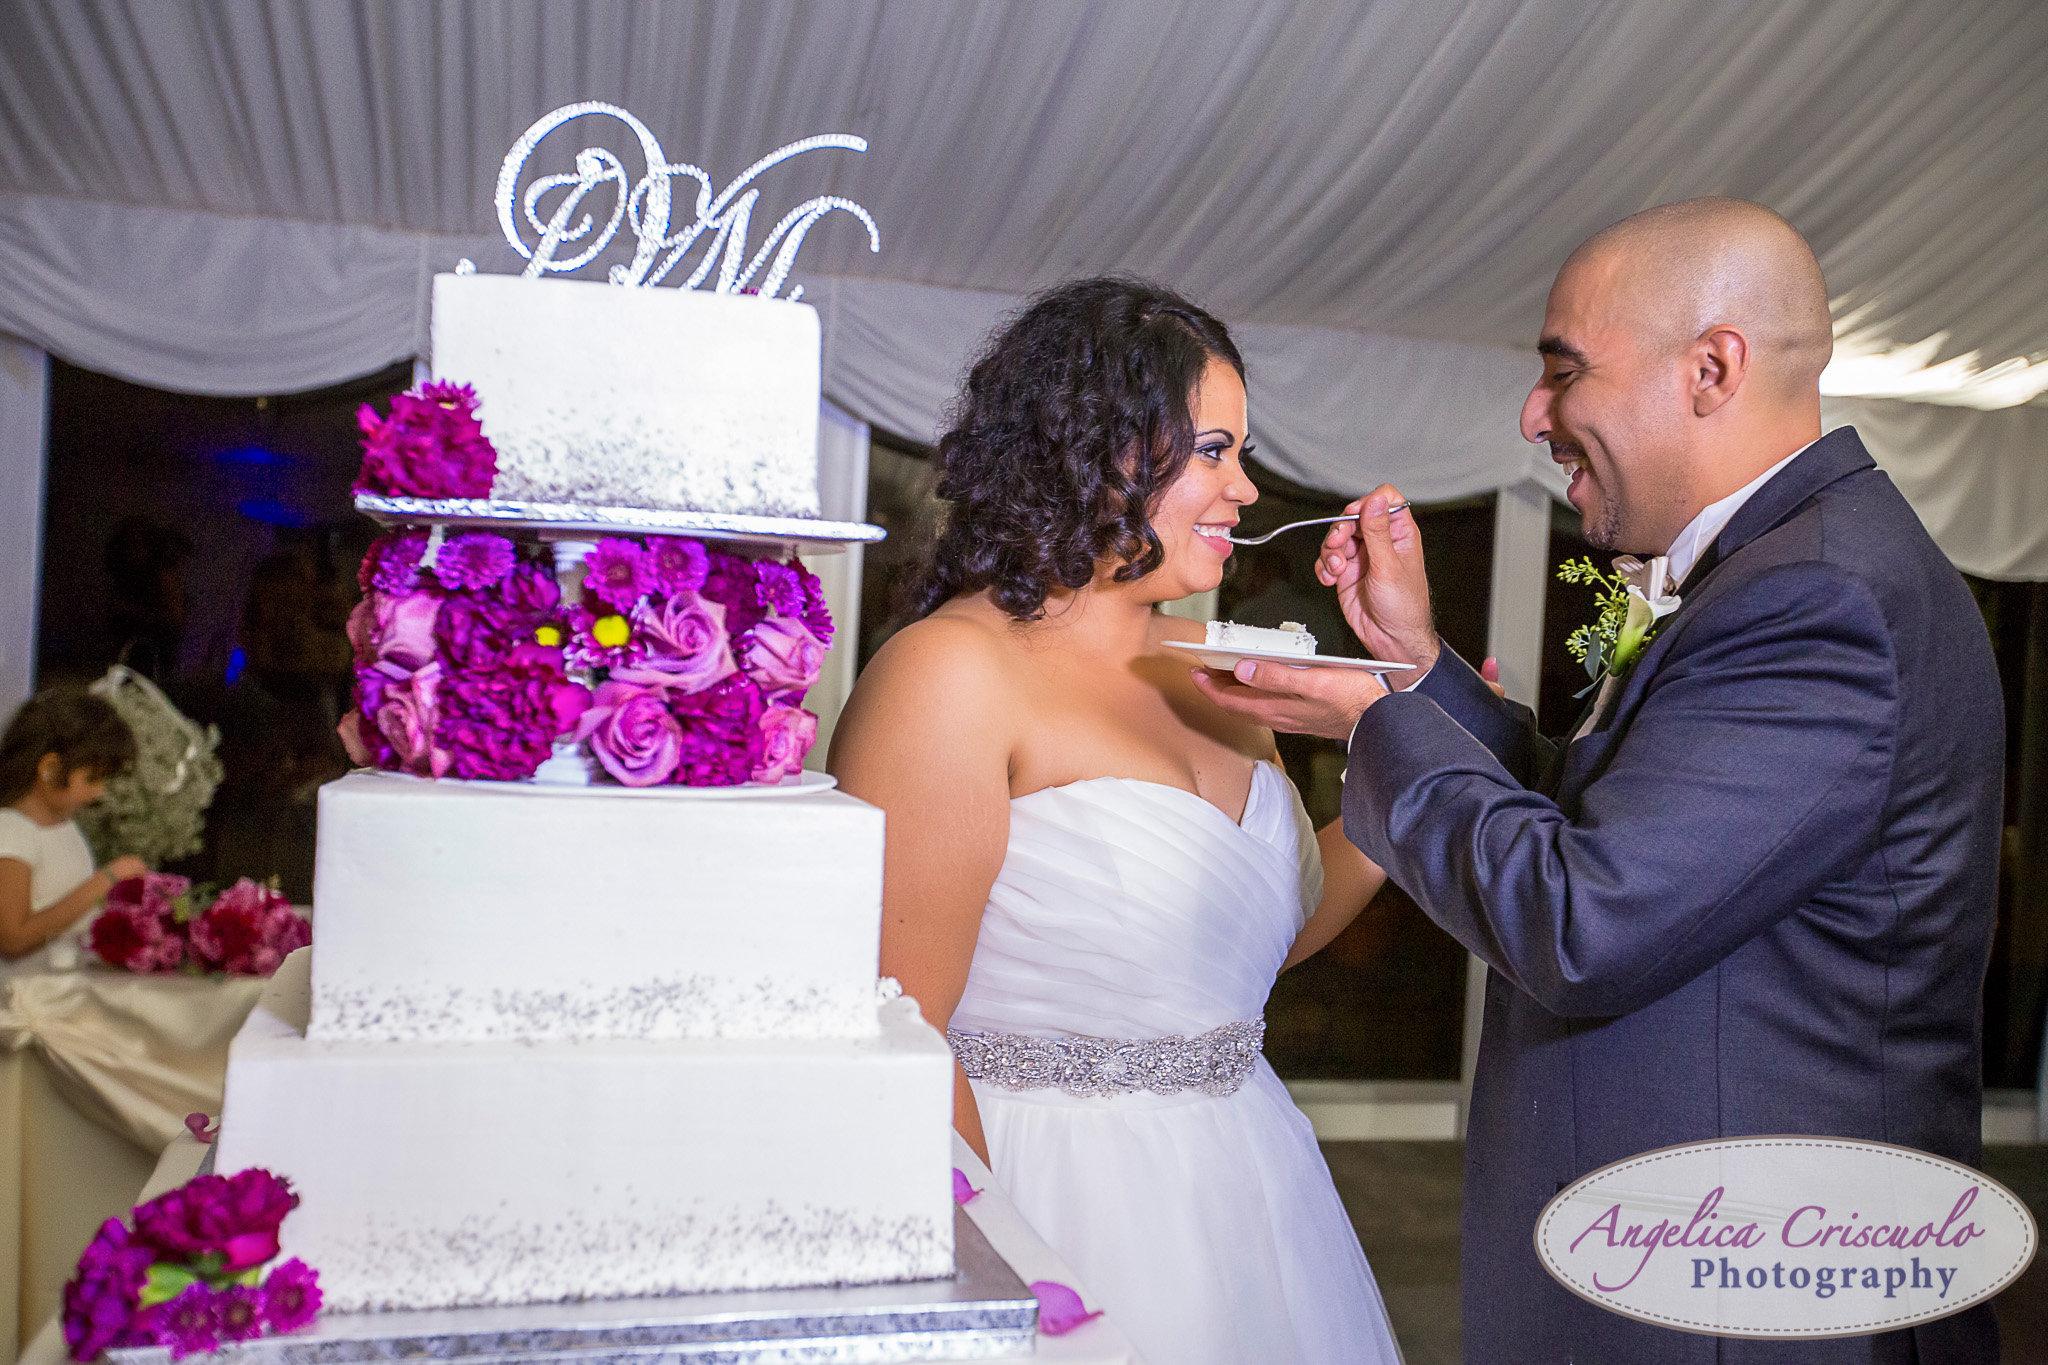 Conti's Pastry Shop wedding cake New York Wedding photographer pelham bay split Rock